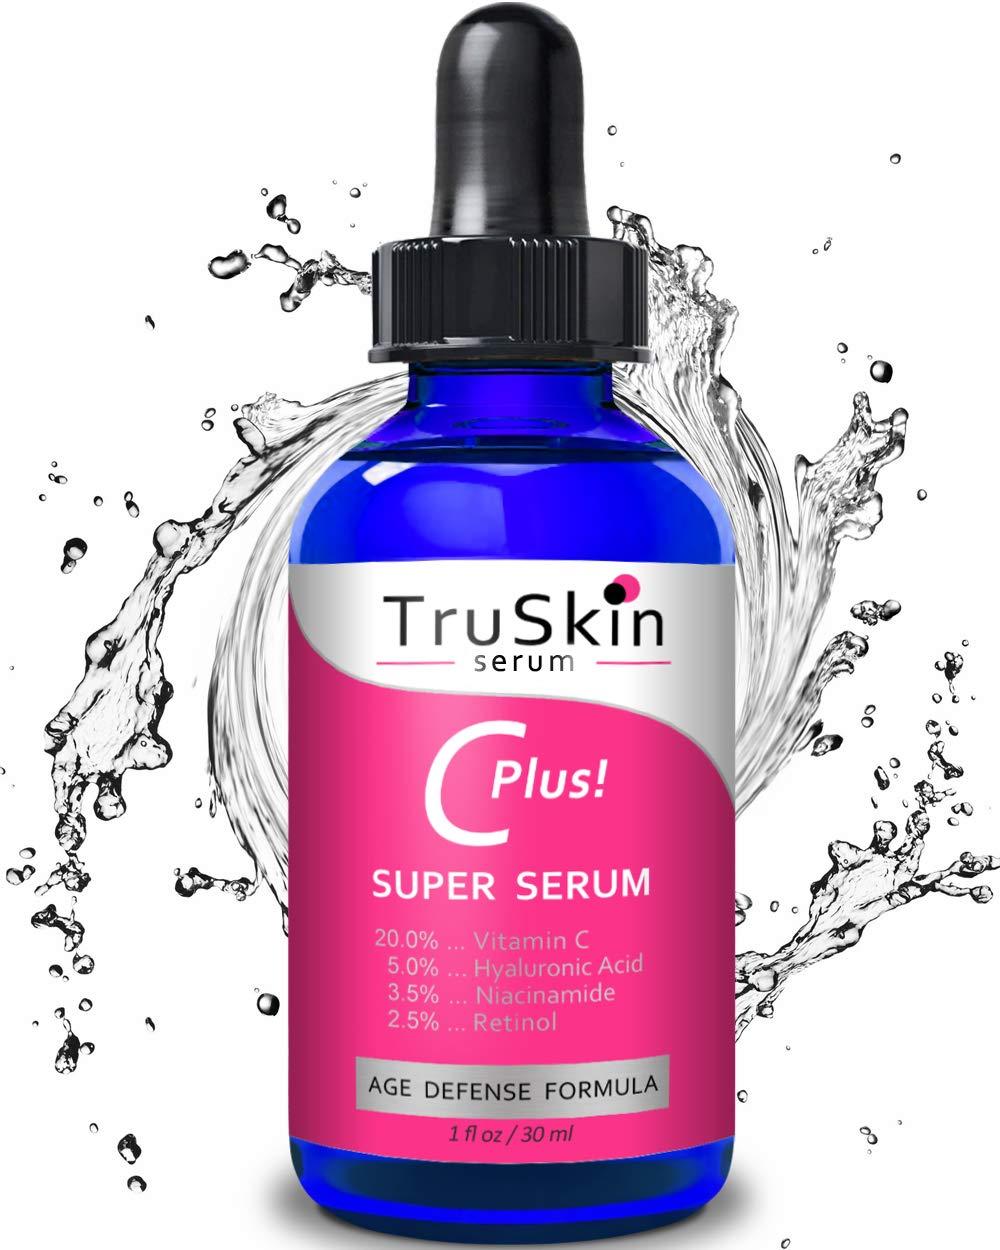 TruSkin Vitamin C-Plus Super Serum, Anti Aging Anti-Wrinkle Facial Serum with Niacinamide, Retinol, Hyaluronic Acid, and Salicylic Acid, 1 oz by TruSkin Naturals (Image #1)